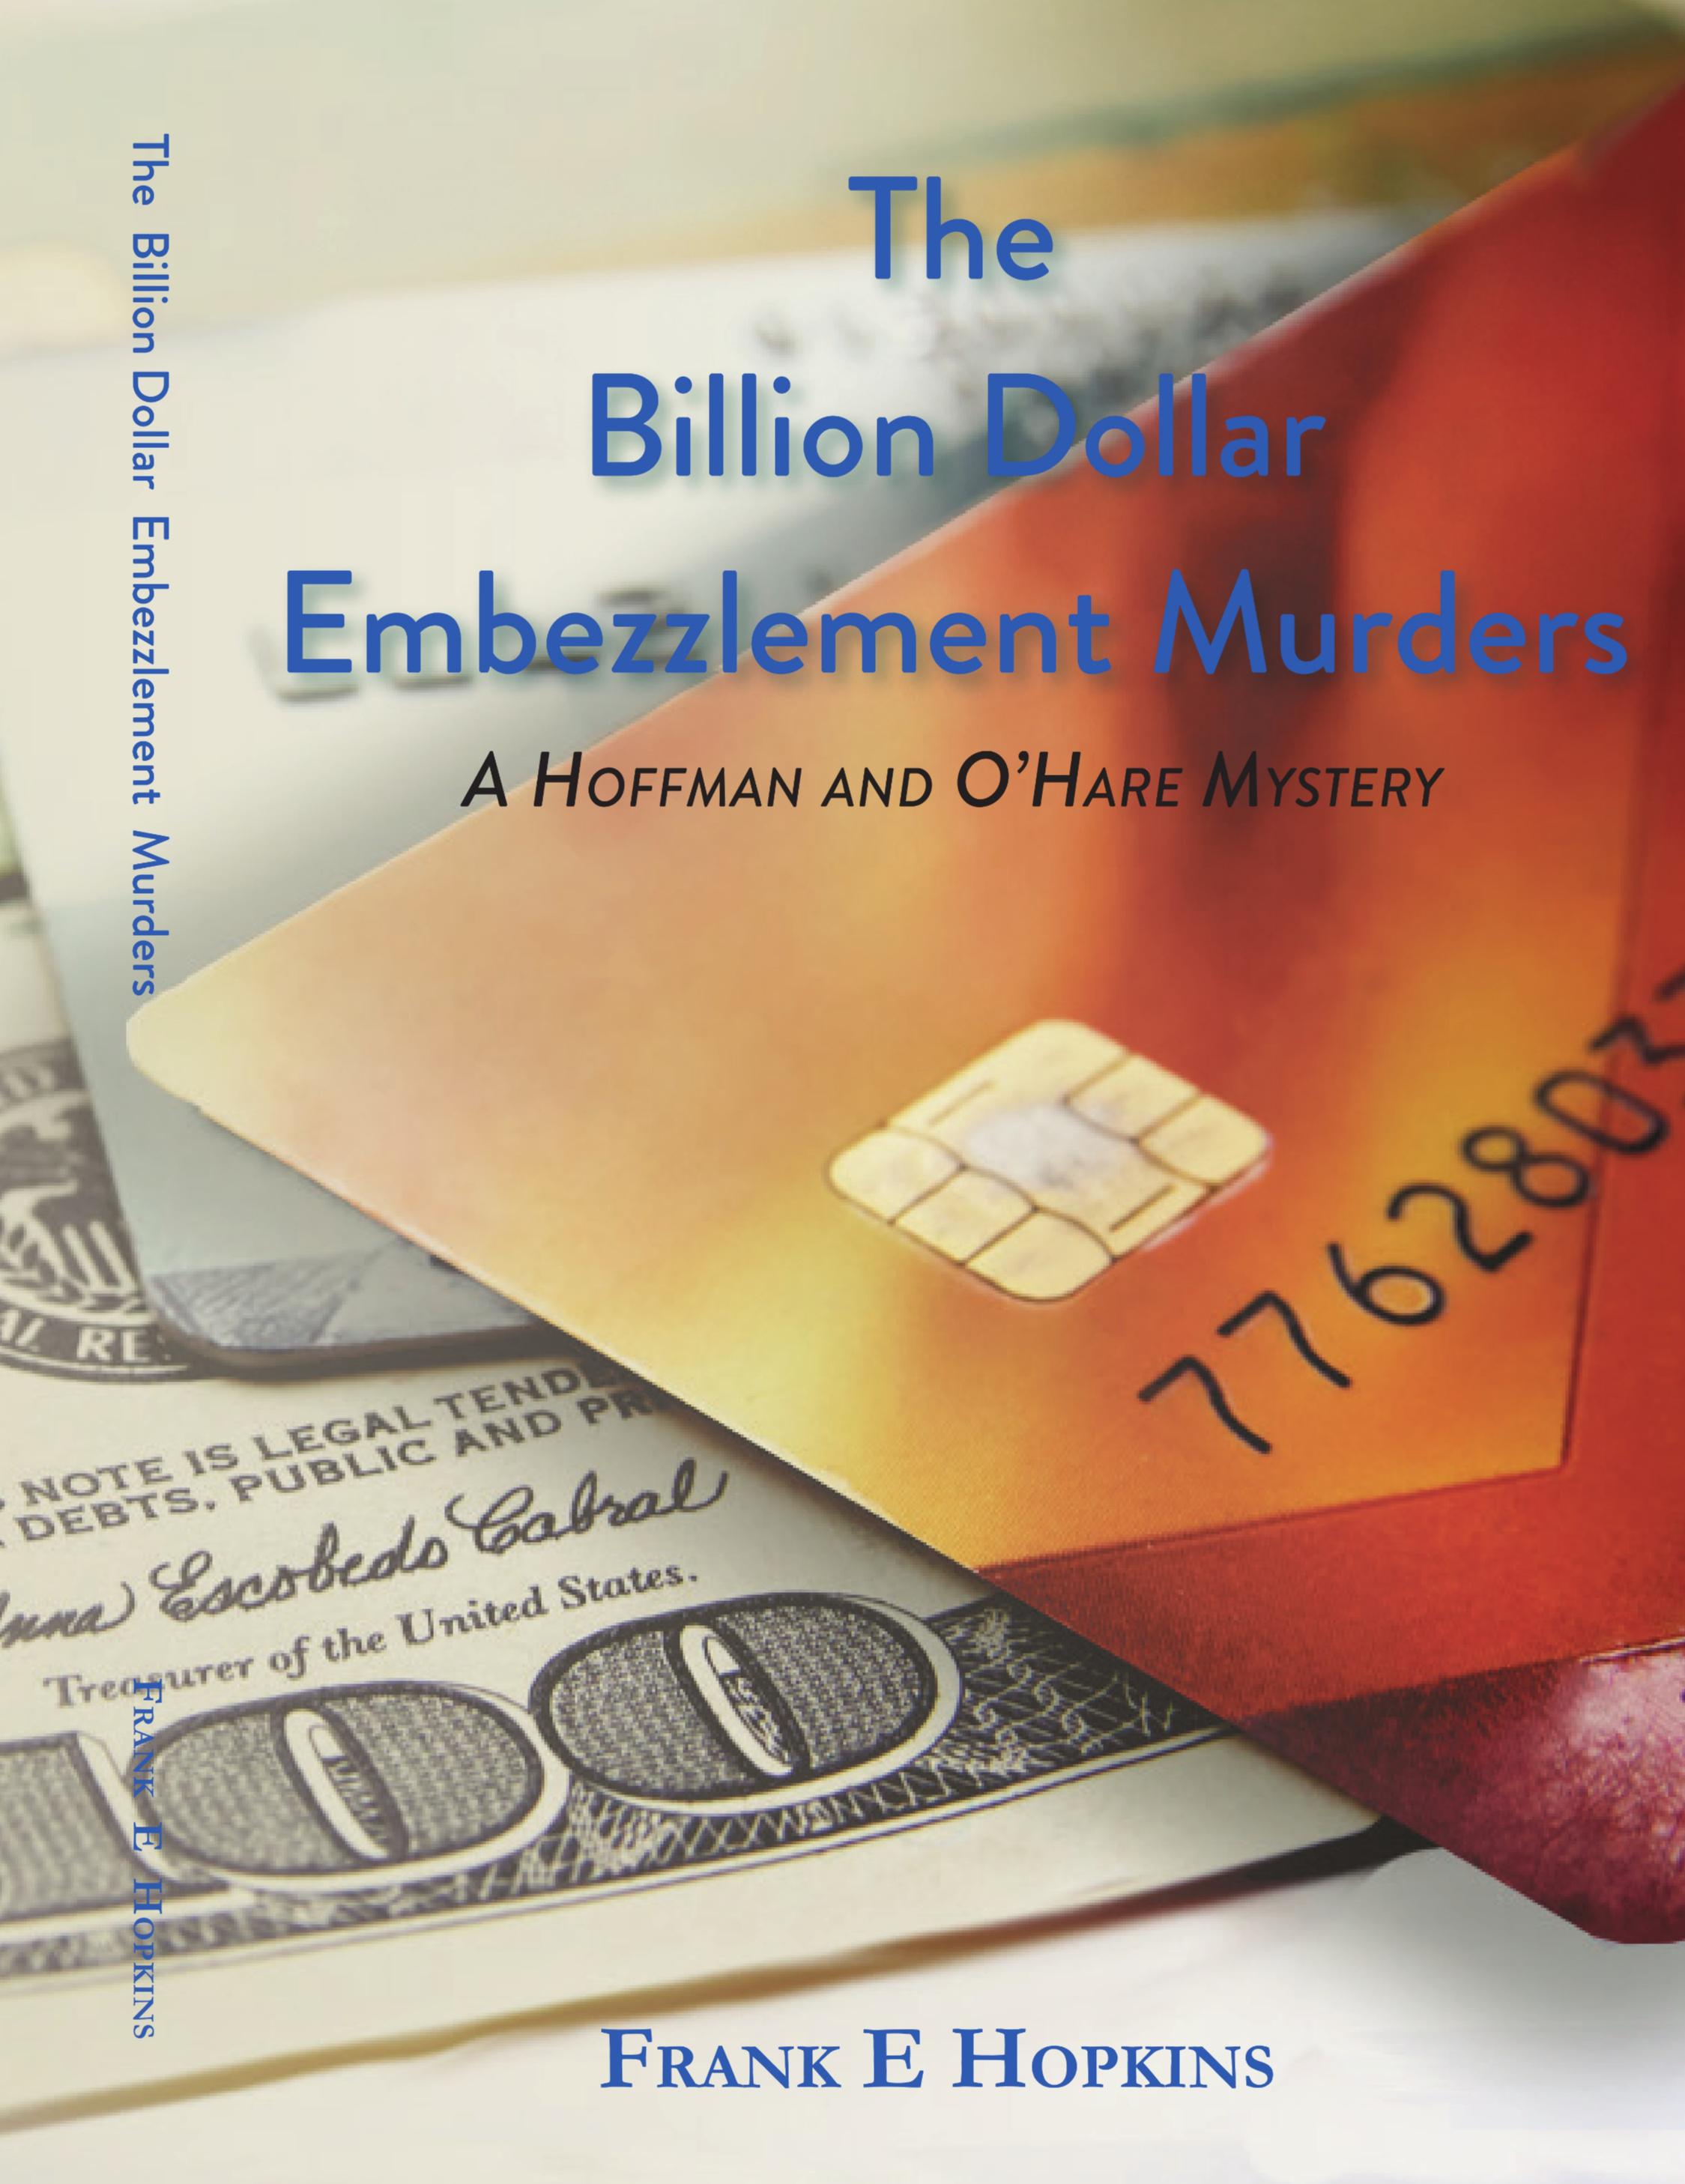 EmbezzlementMurders_cover4_001(1).jpg